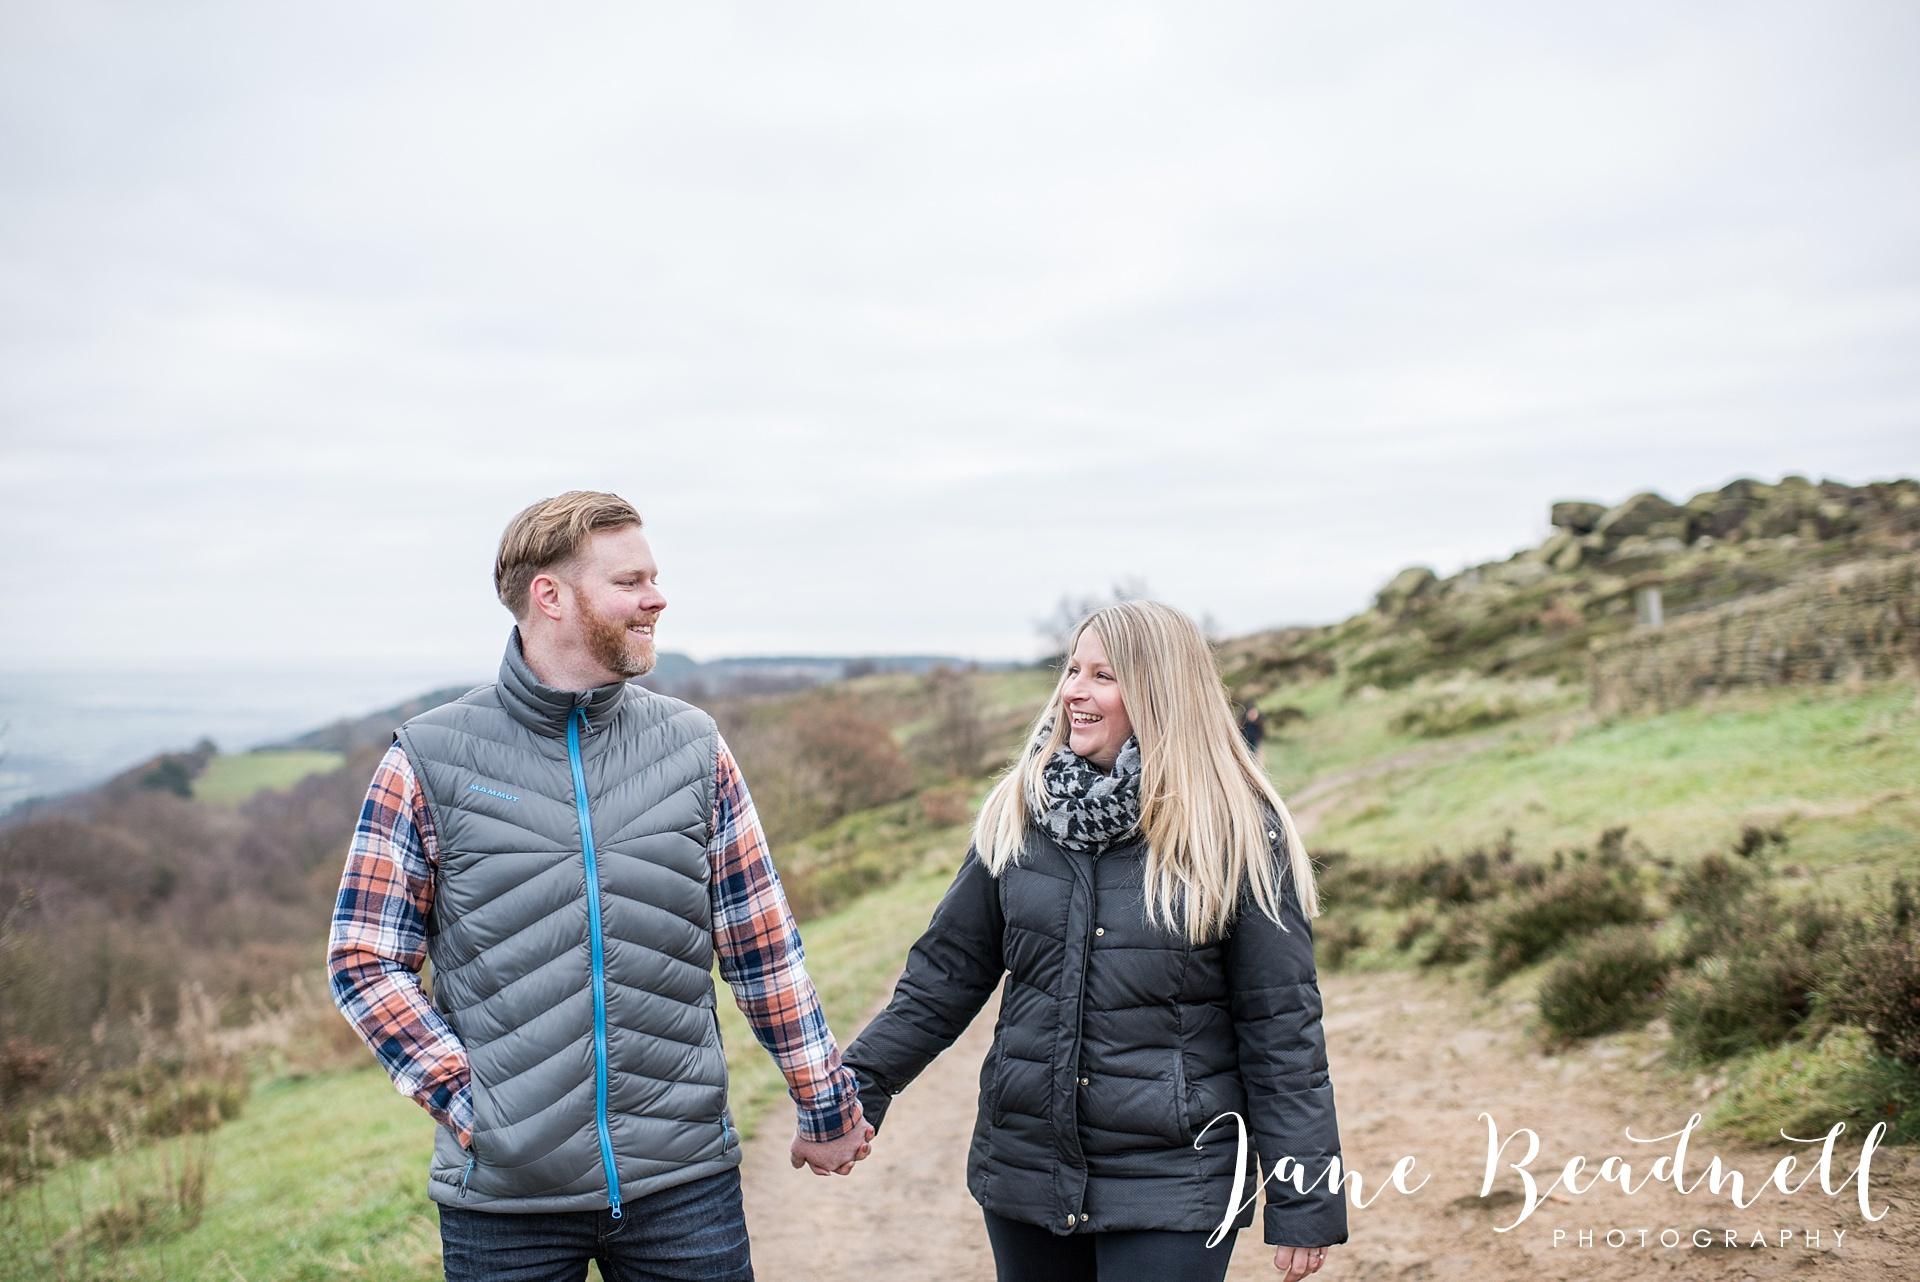 yorkshire-wedding-photographer-jane-beadnell-photography-uk-and-destination-wedding-photographer-engagement-shoot_0008